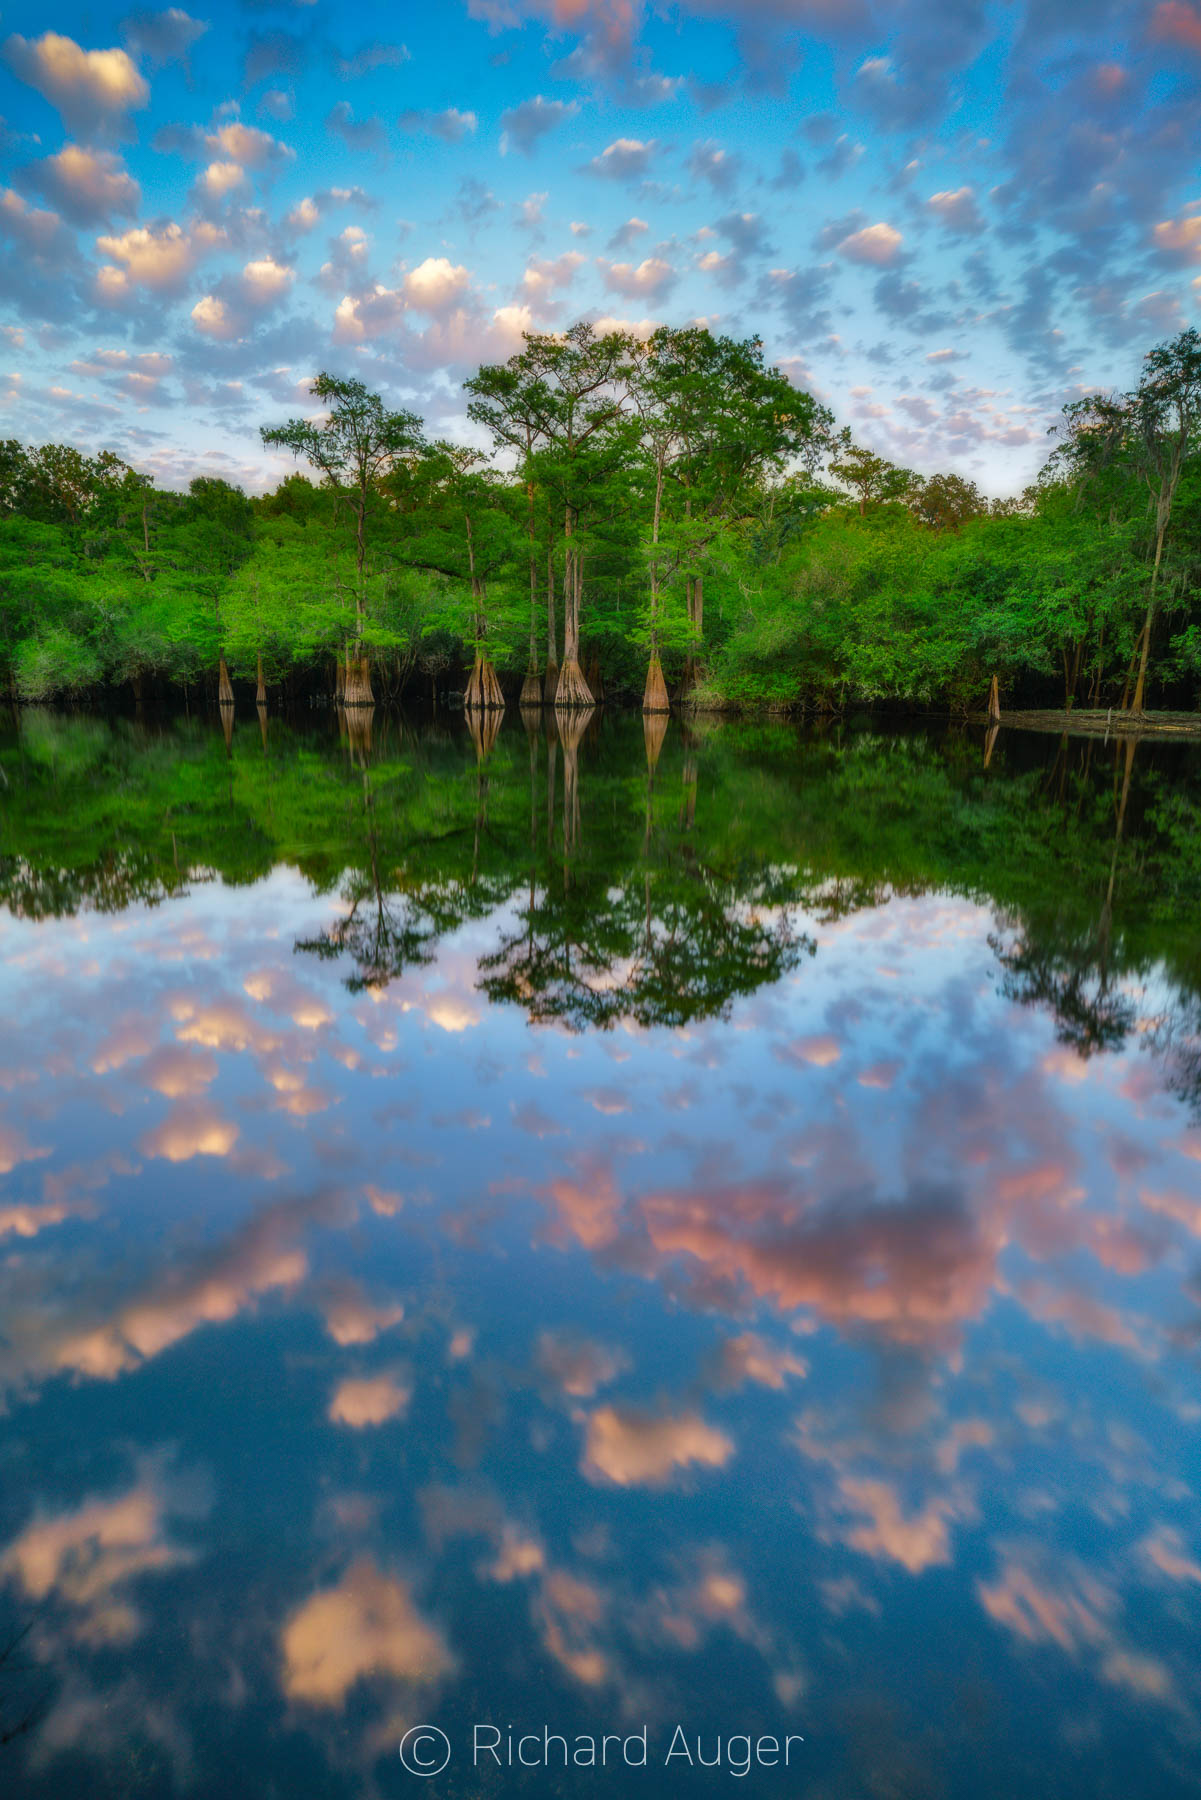 Santa Fe River, Florida, Sunset, Orange, Blue, Clouds, Cypress, Water, Photograph, Photographer, Nature, Landscape